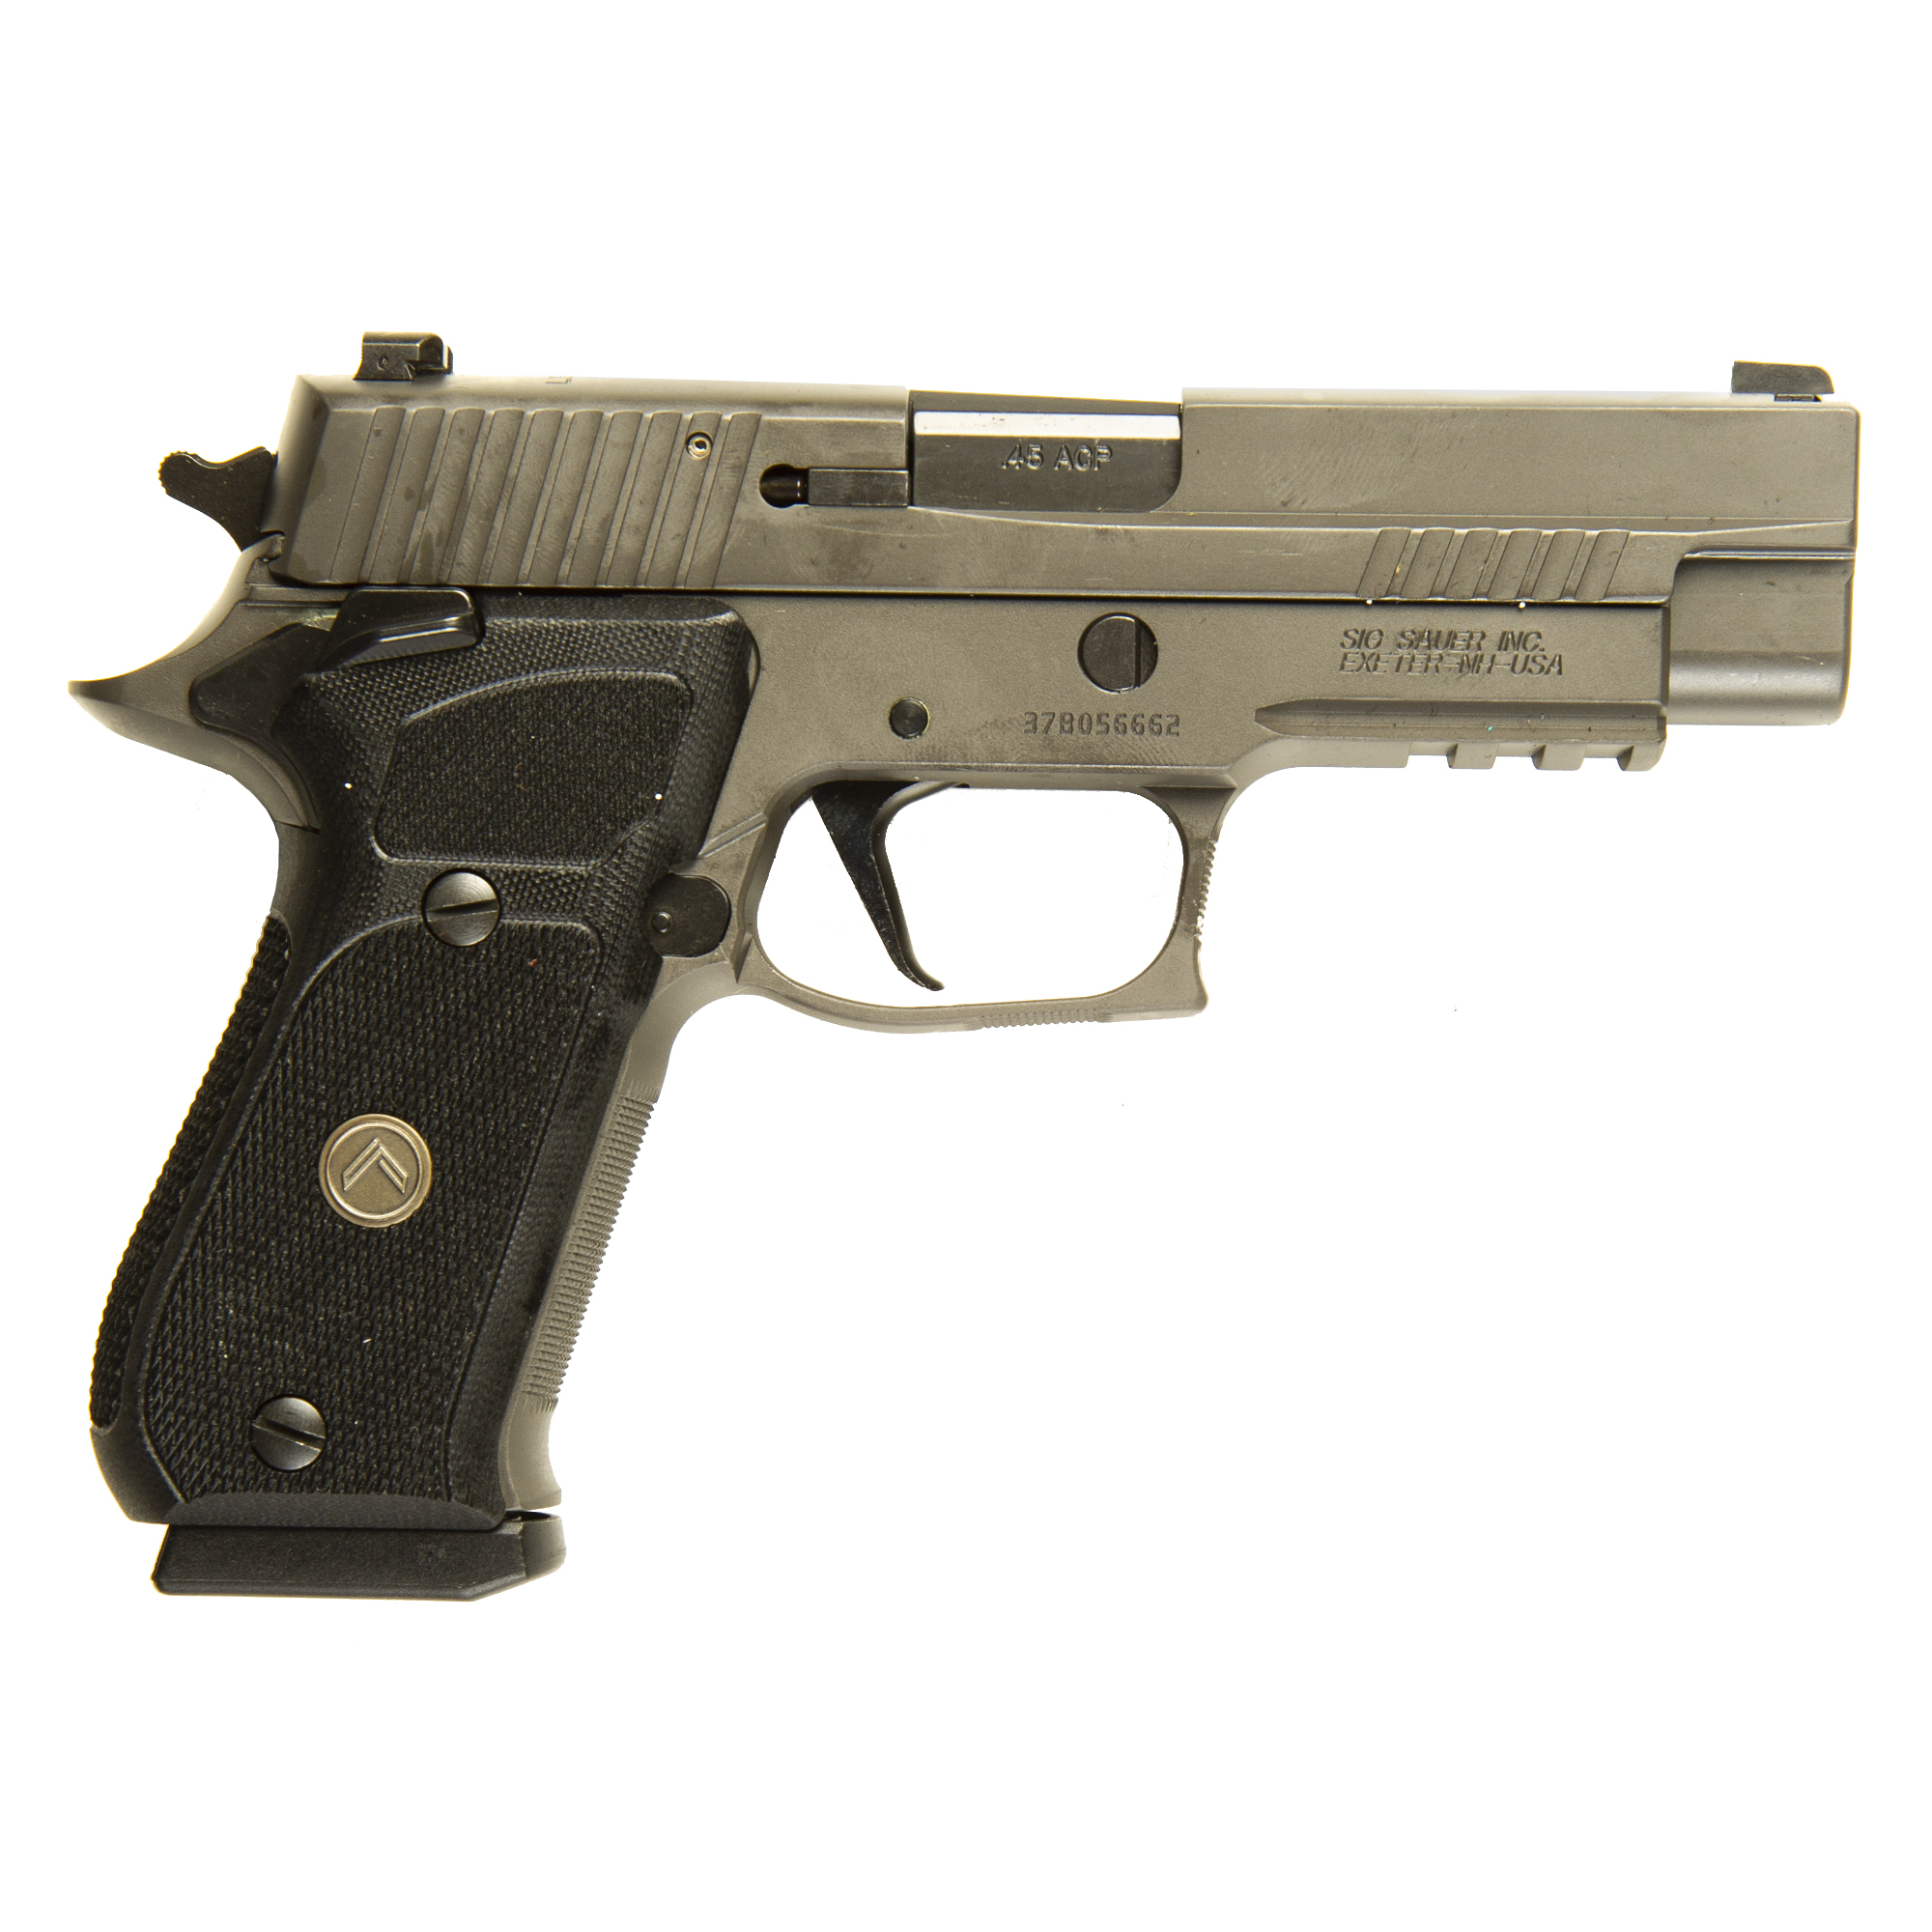 Used SIG Sauer P220 Legion Handgun, .45 ACP